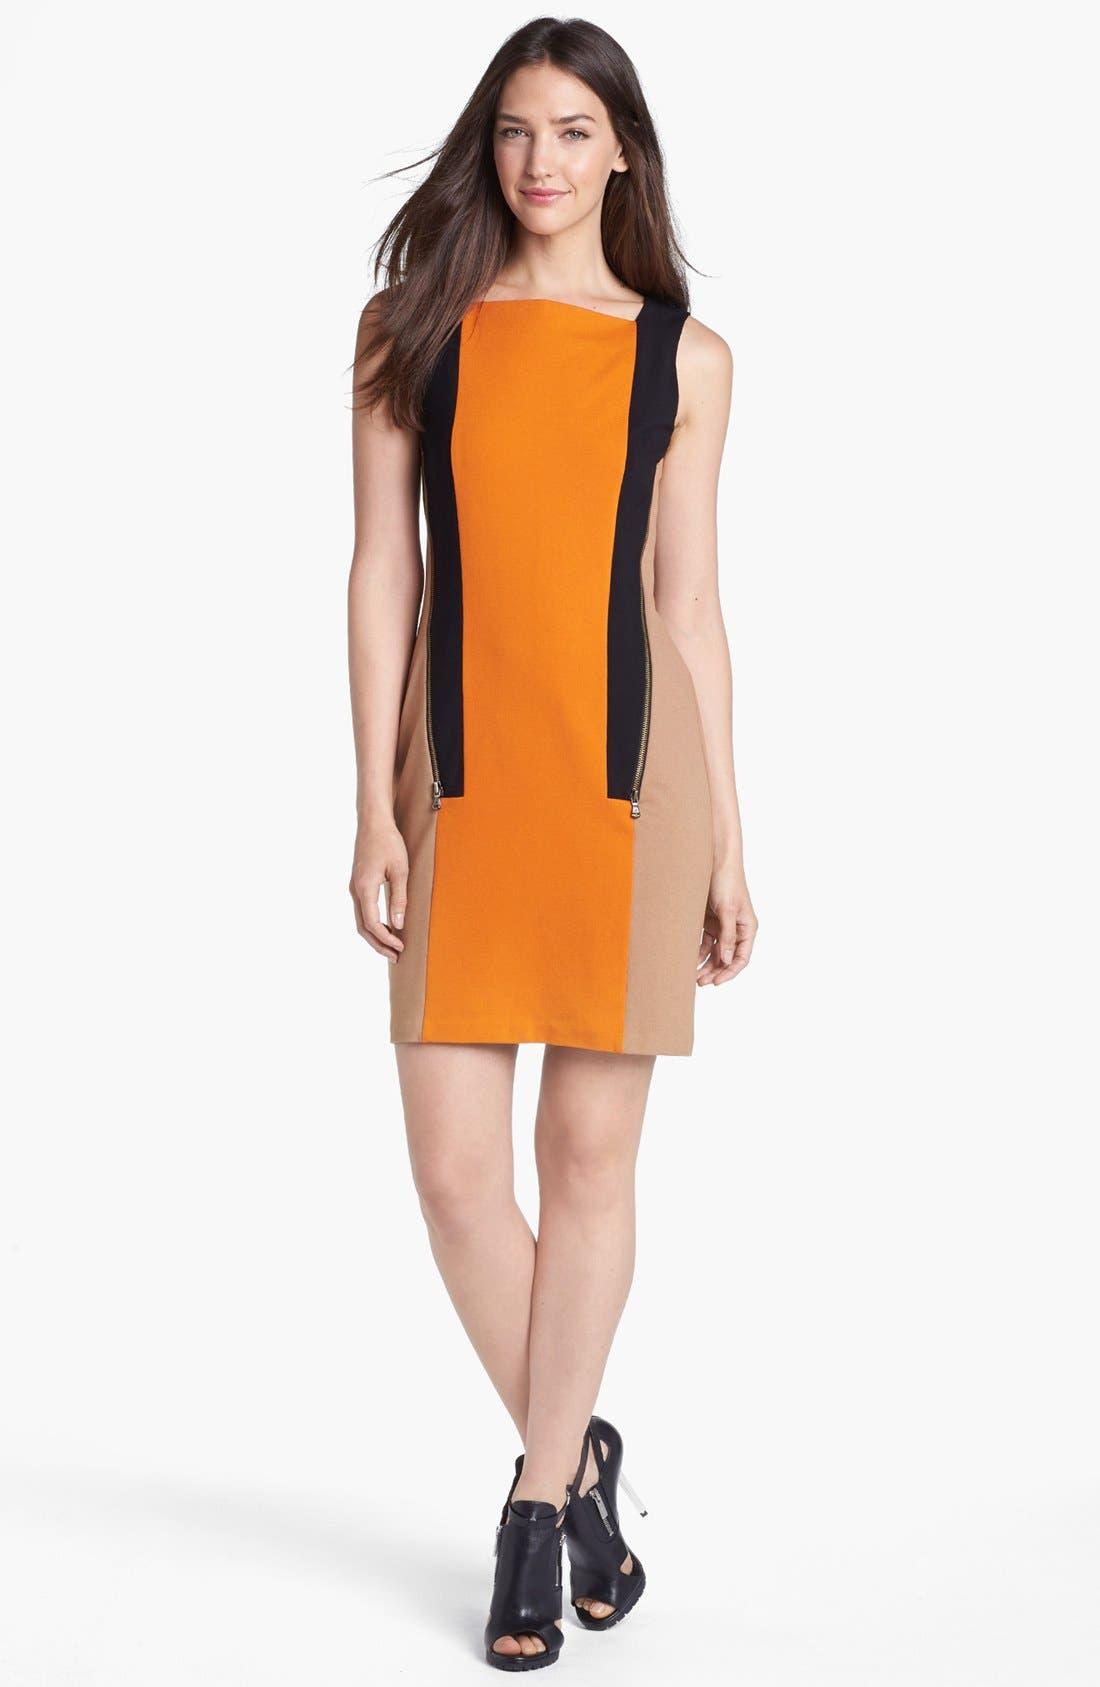 Main Image - Kenneth Cole New York 'Hulda' Zip Colorblock Dress